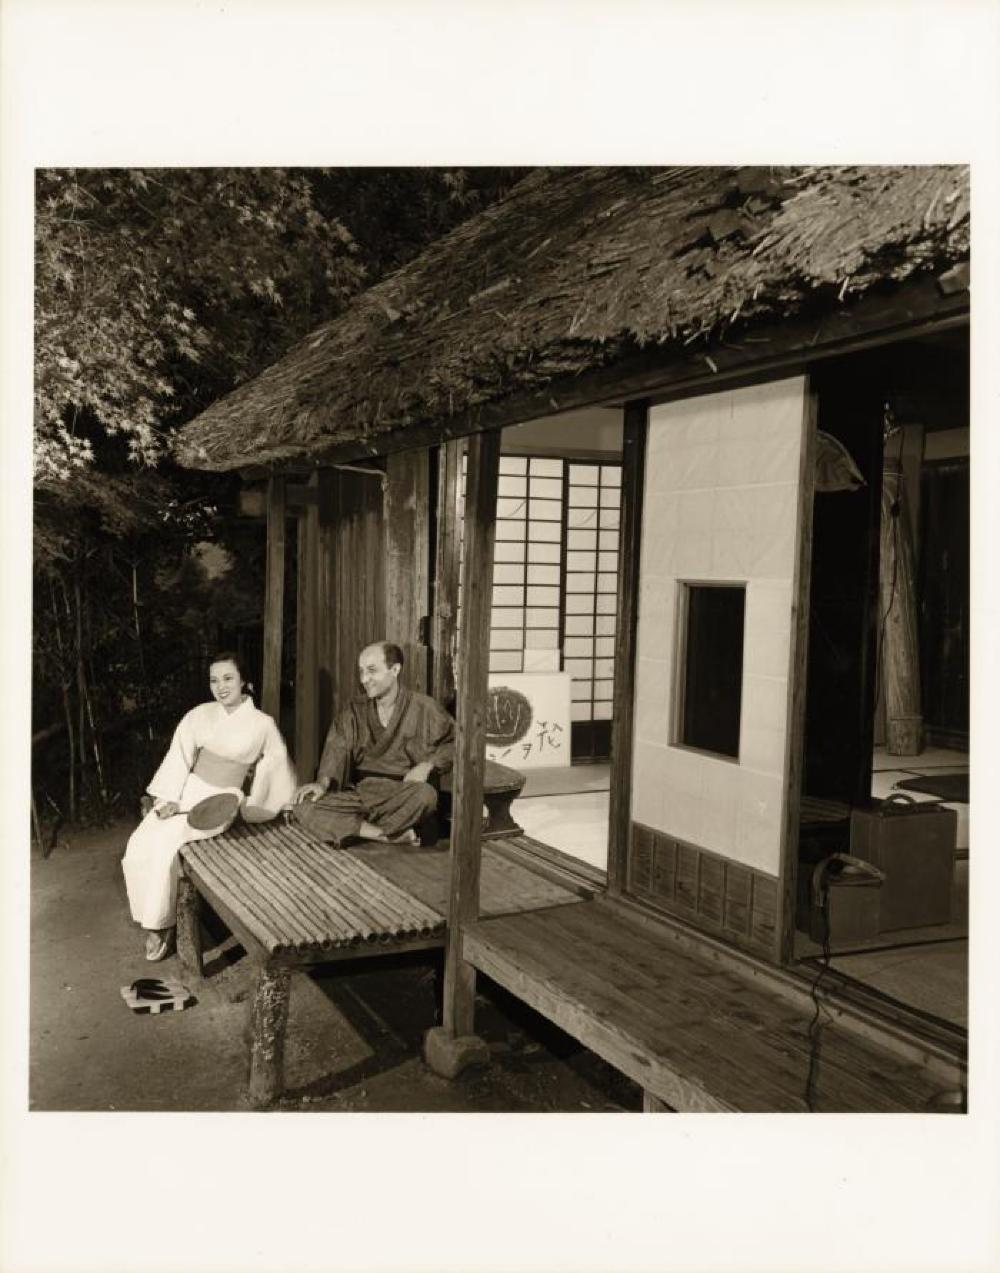 Yoshiko Yamaguchi and Isamu Noguchi at their home in Kita-Kamakura, Japan